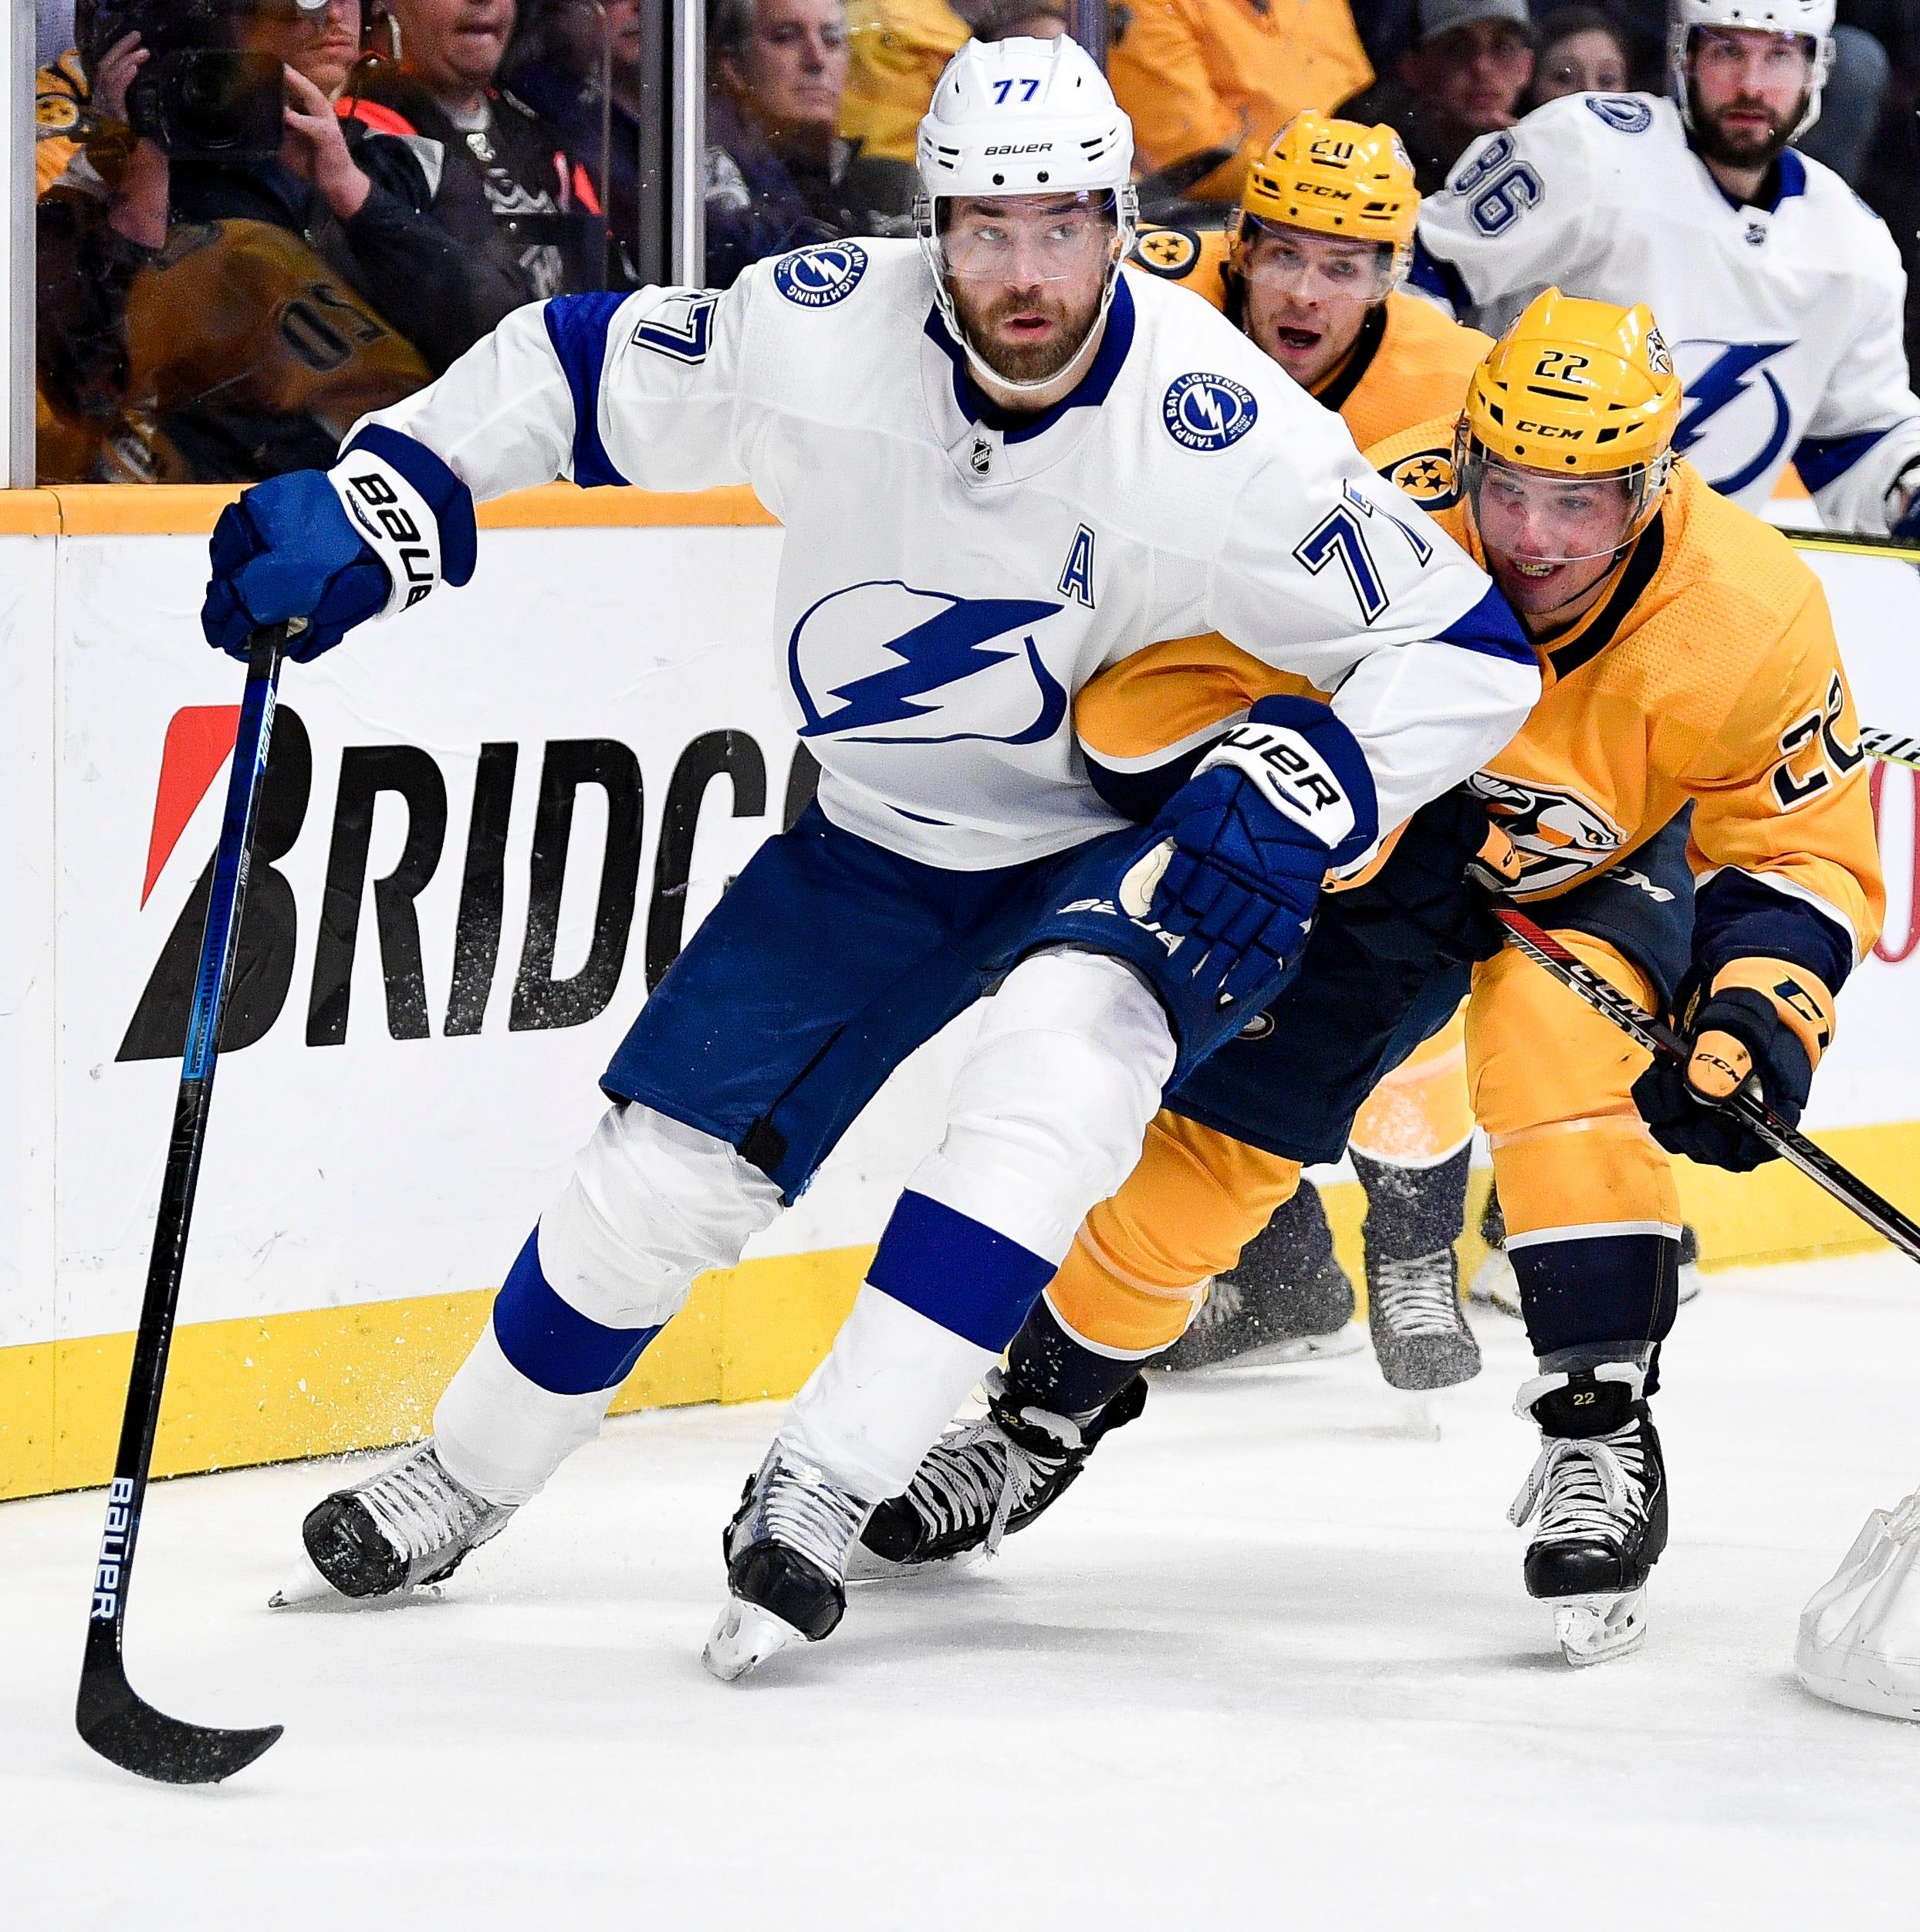 NHL Playoff Matchups: 2019 Stanley Cup Playoffs, first round